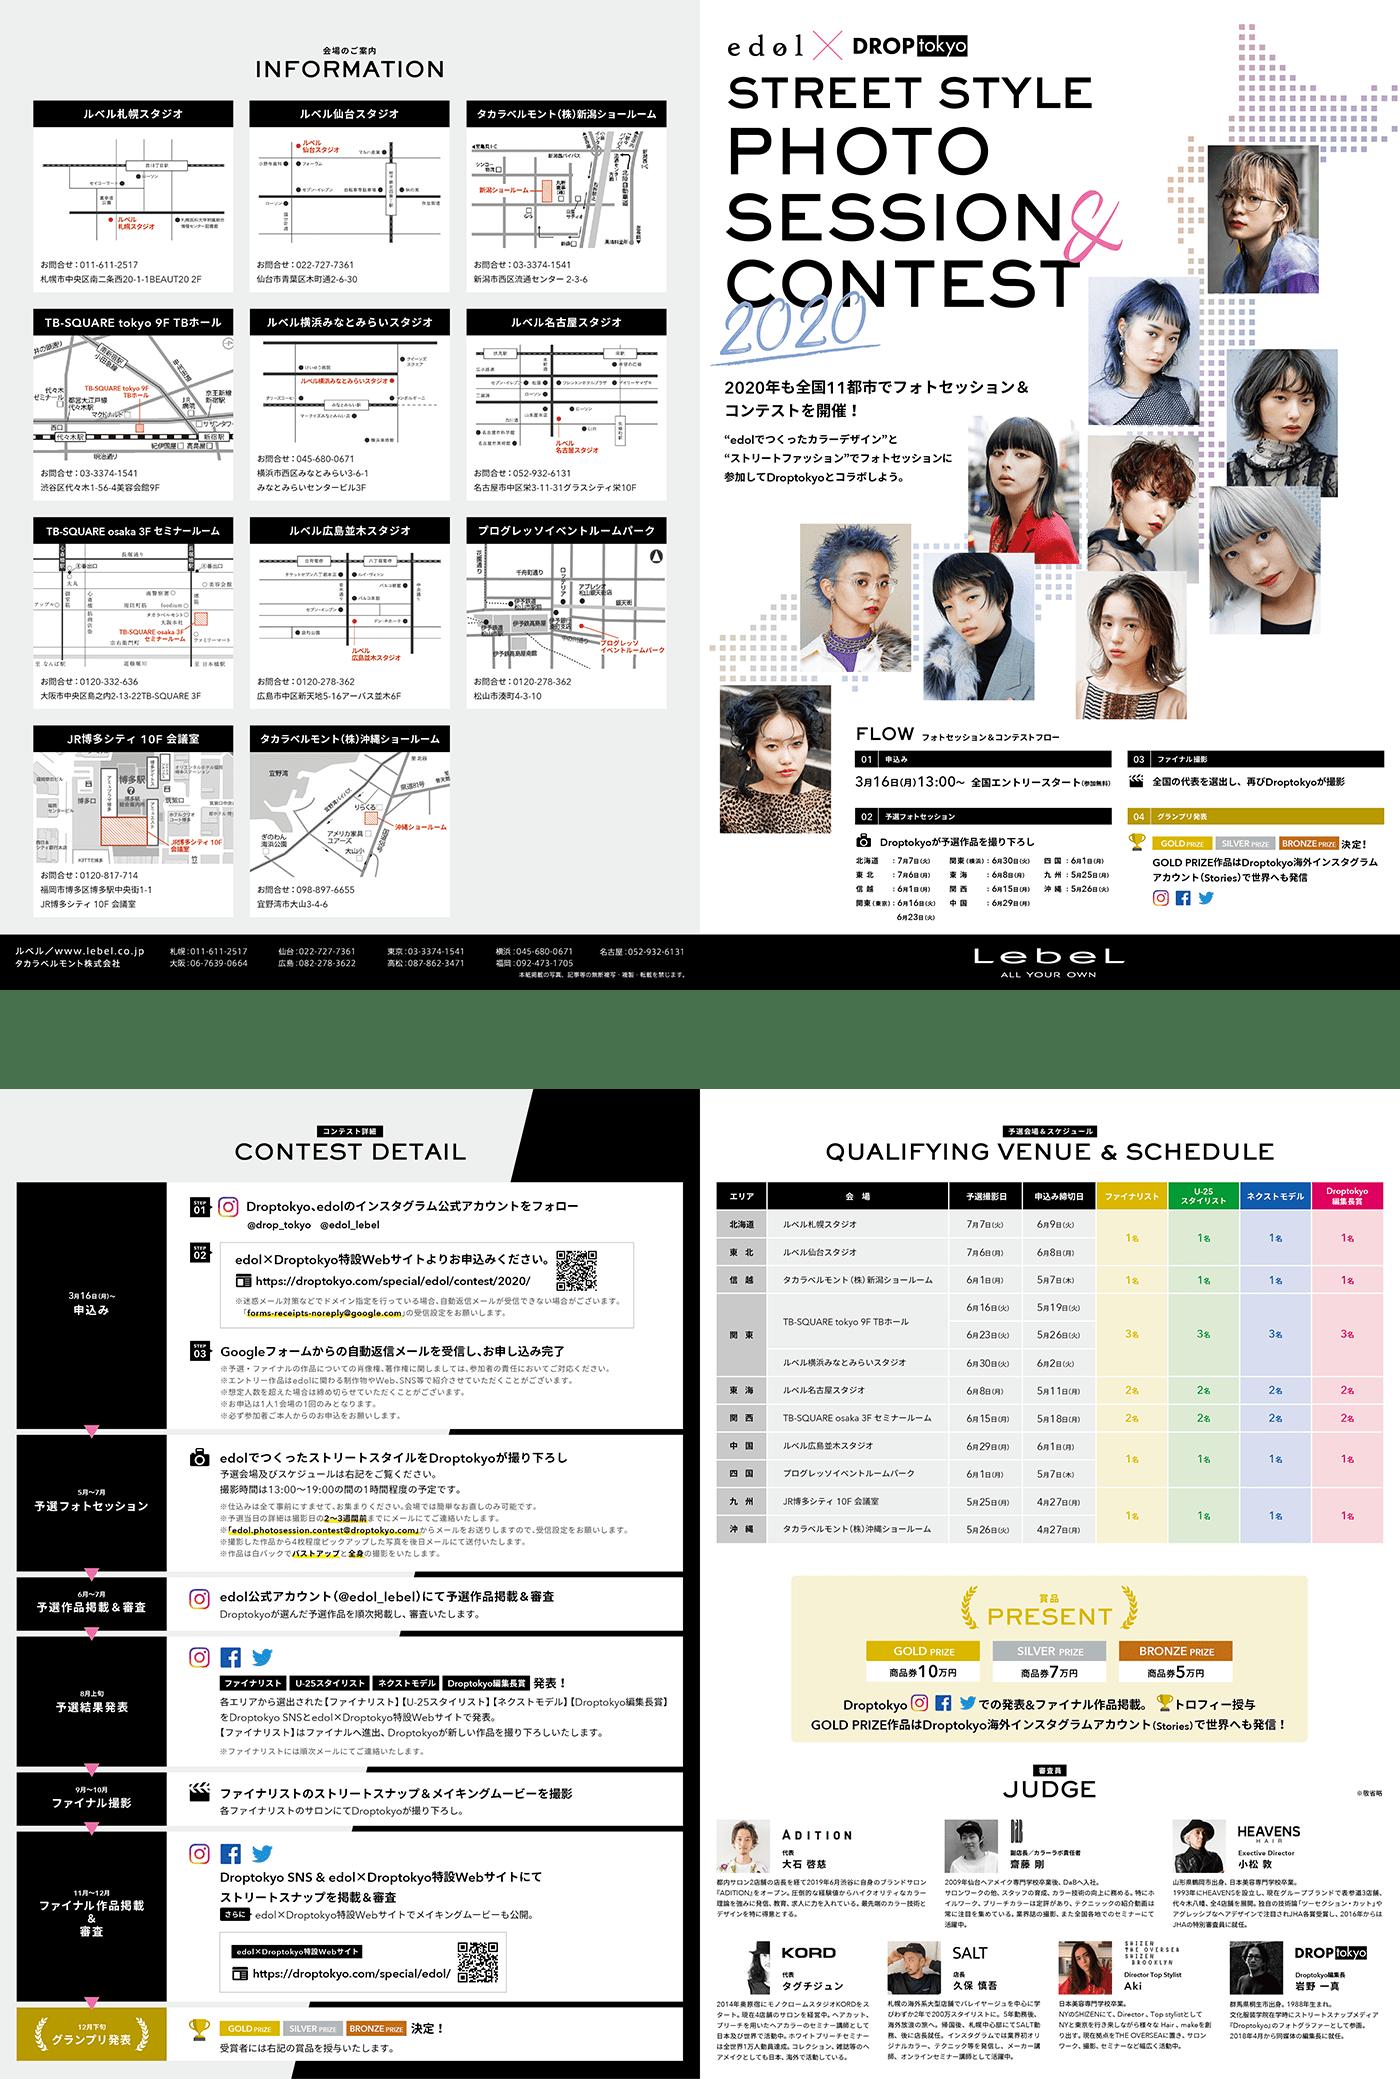 [edol × Droptokyo] STREET STYLE PHOTO SESSION & CONTEST 2020 Flyer